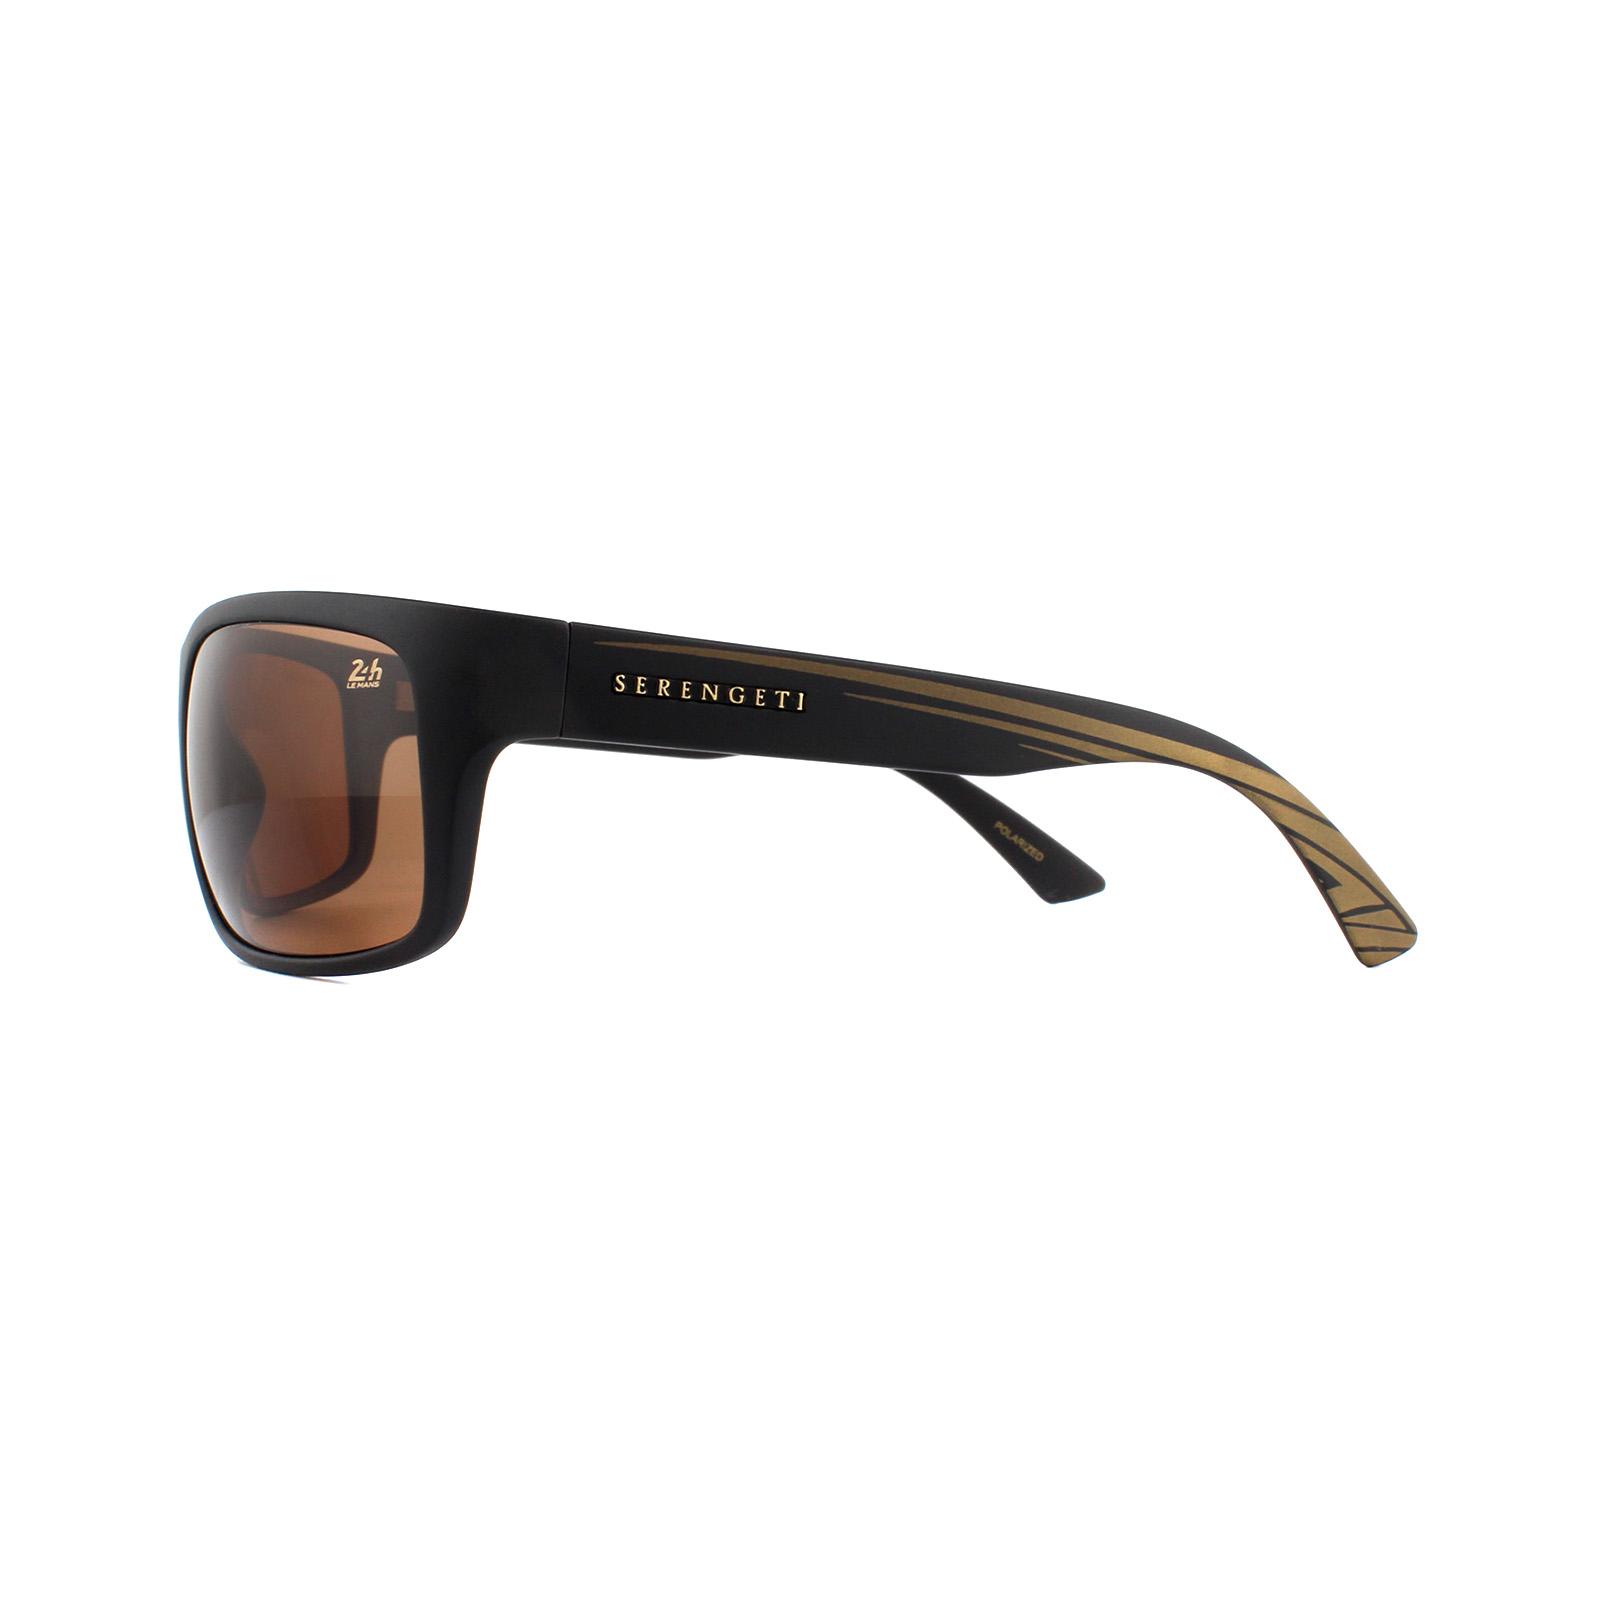 ad4cf51477 Cheap Serengeti Pistoia Sunglasses - Discounted Sunglasses